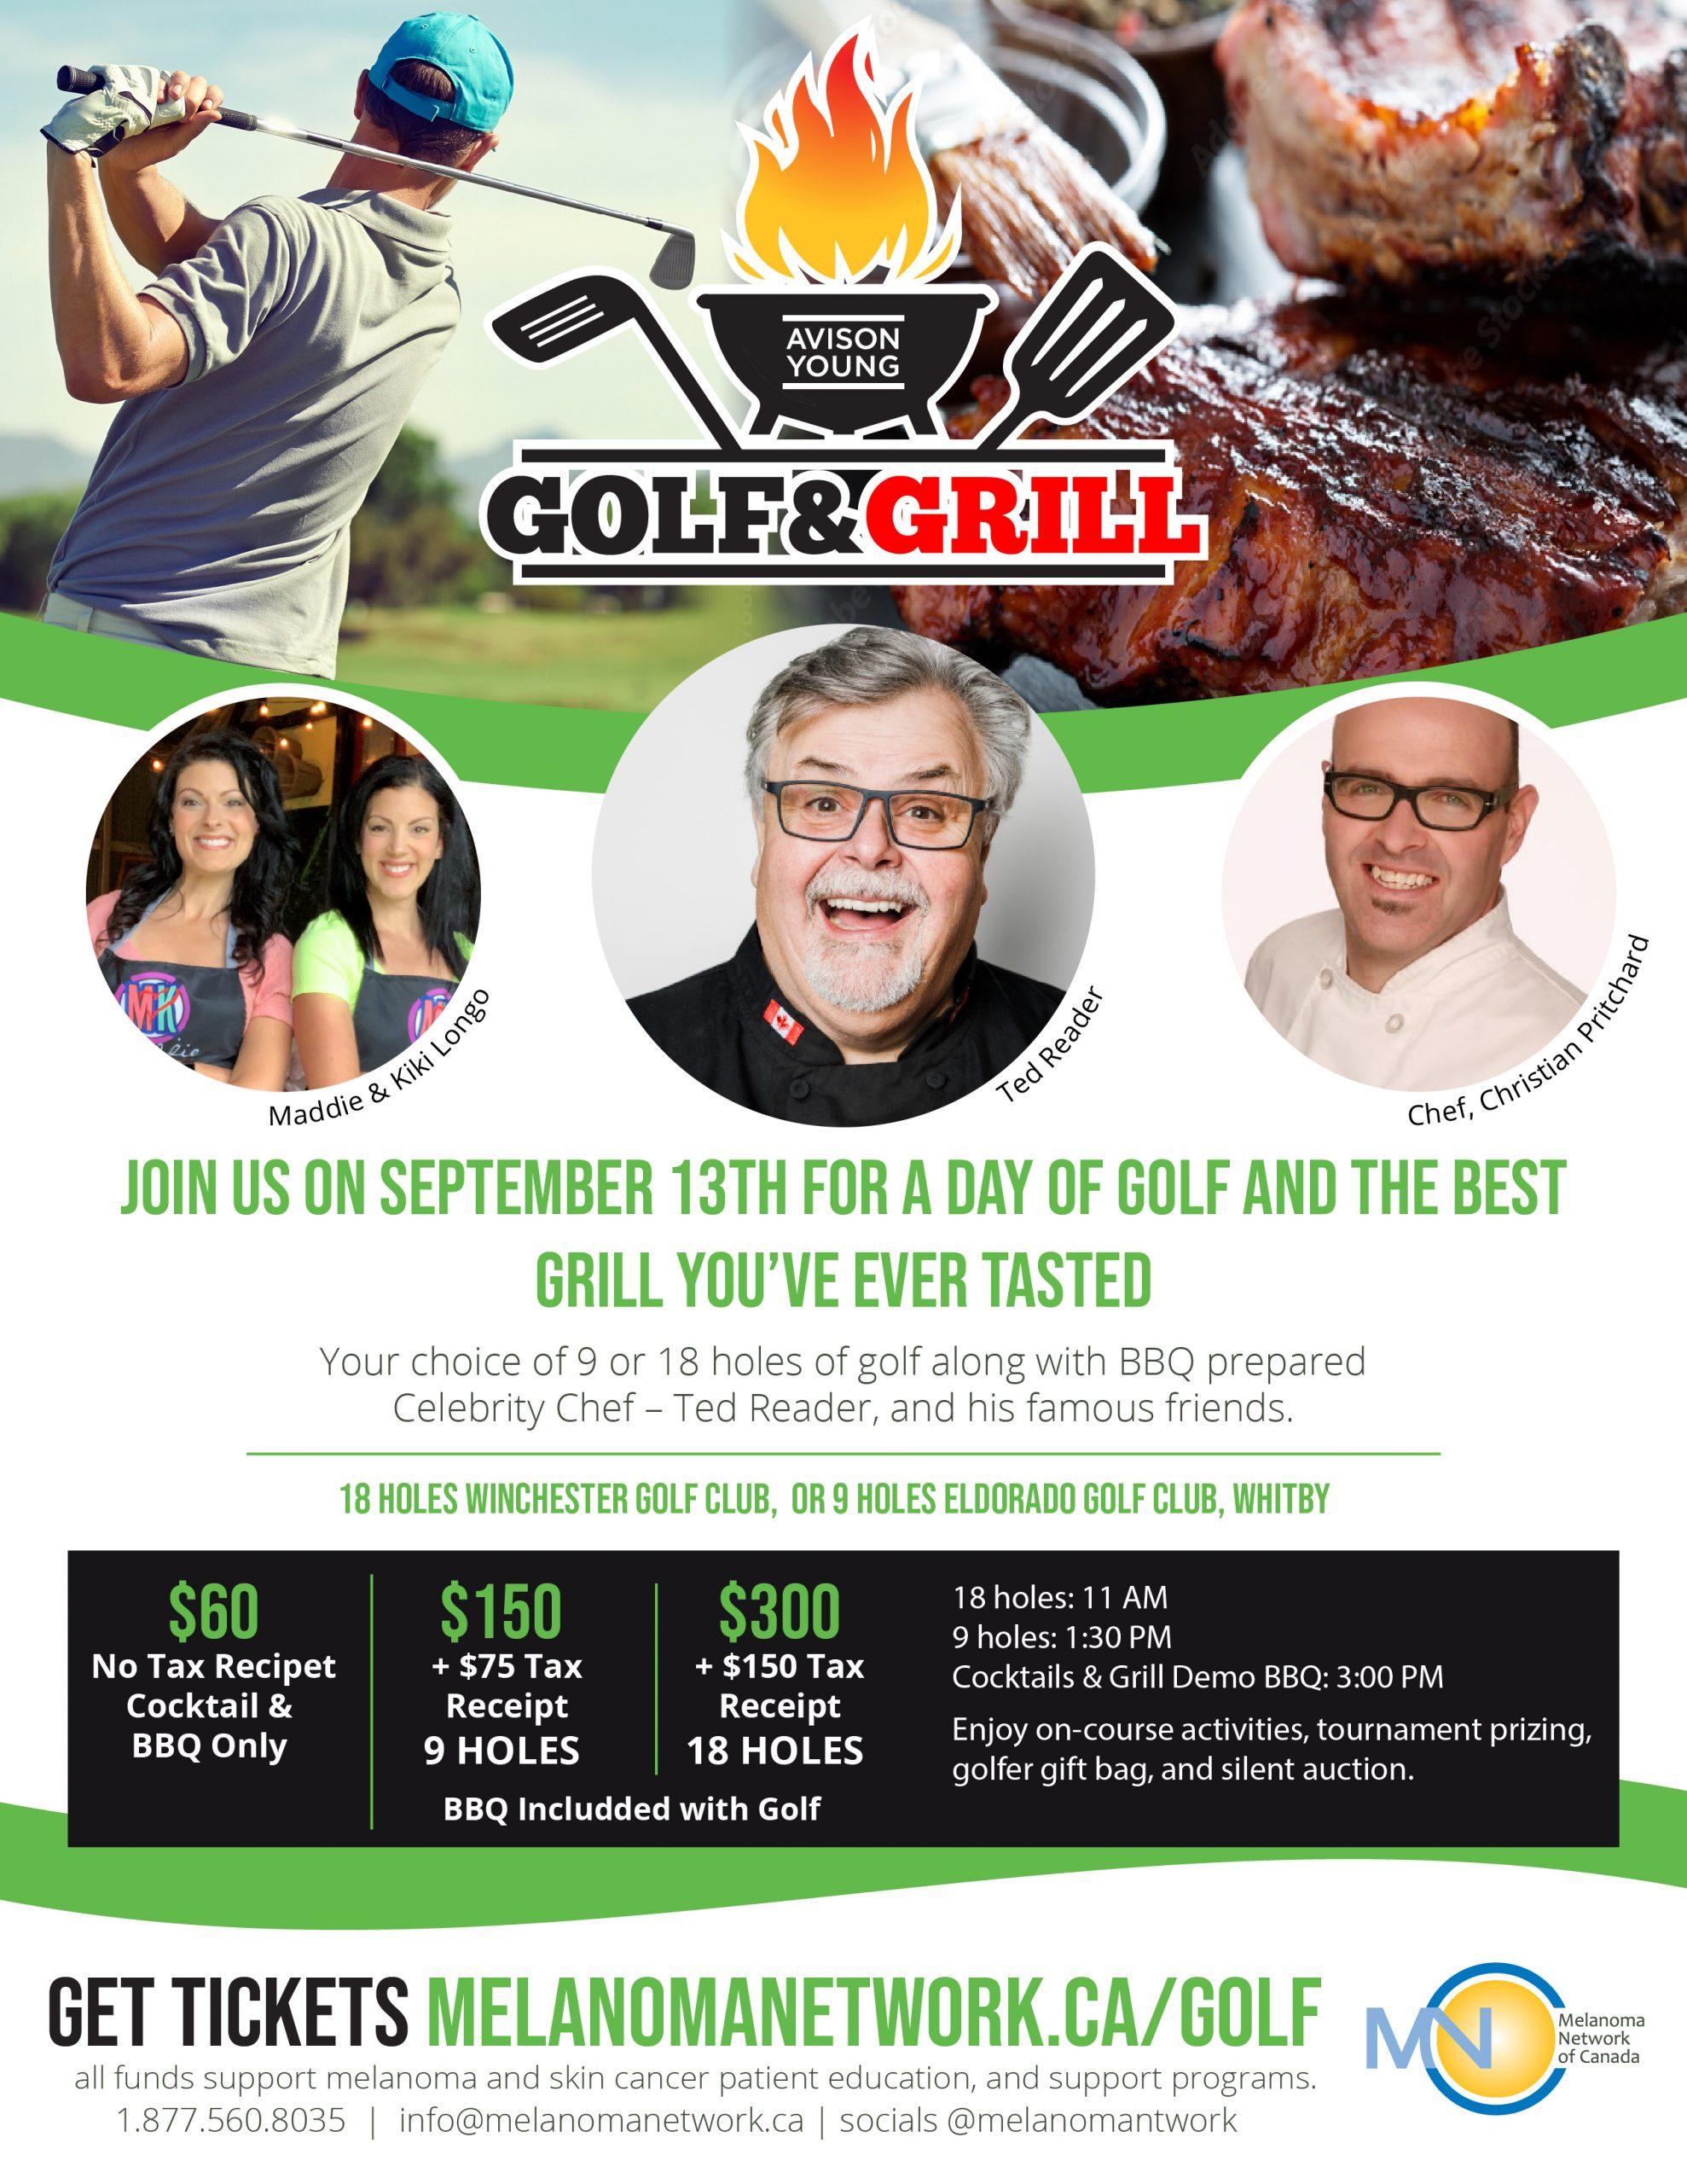 Golf and Grill Charity Golf Tournament @ Winchester Golf Club & Eldorado Golf Club, Whitby, ON